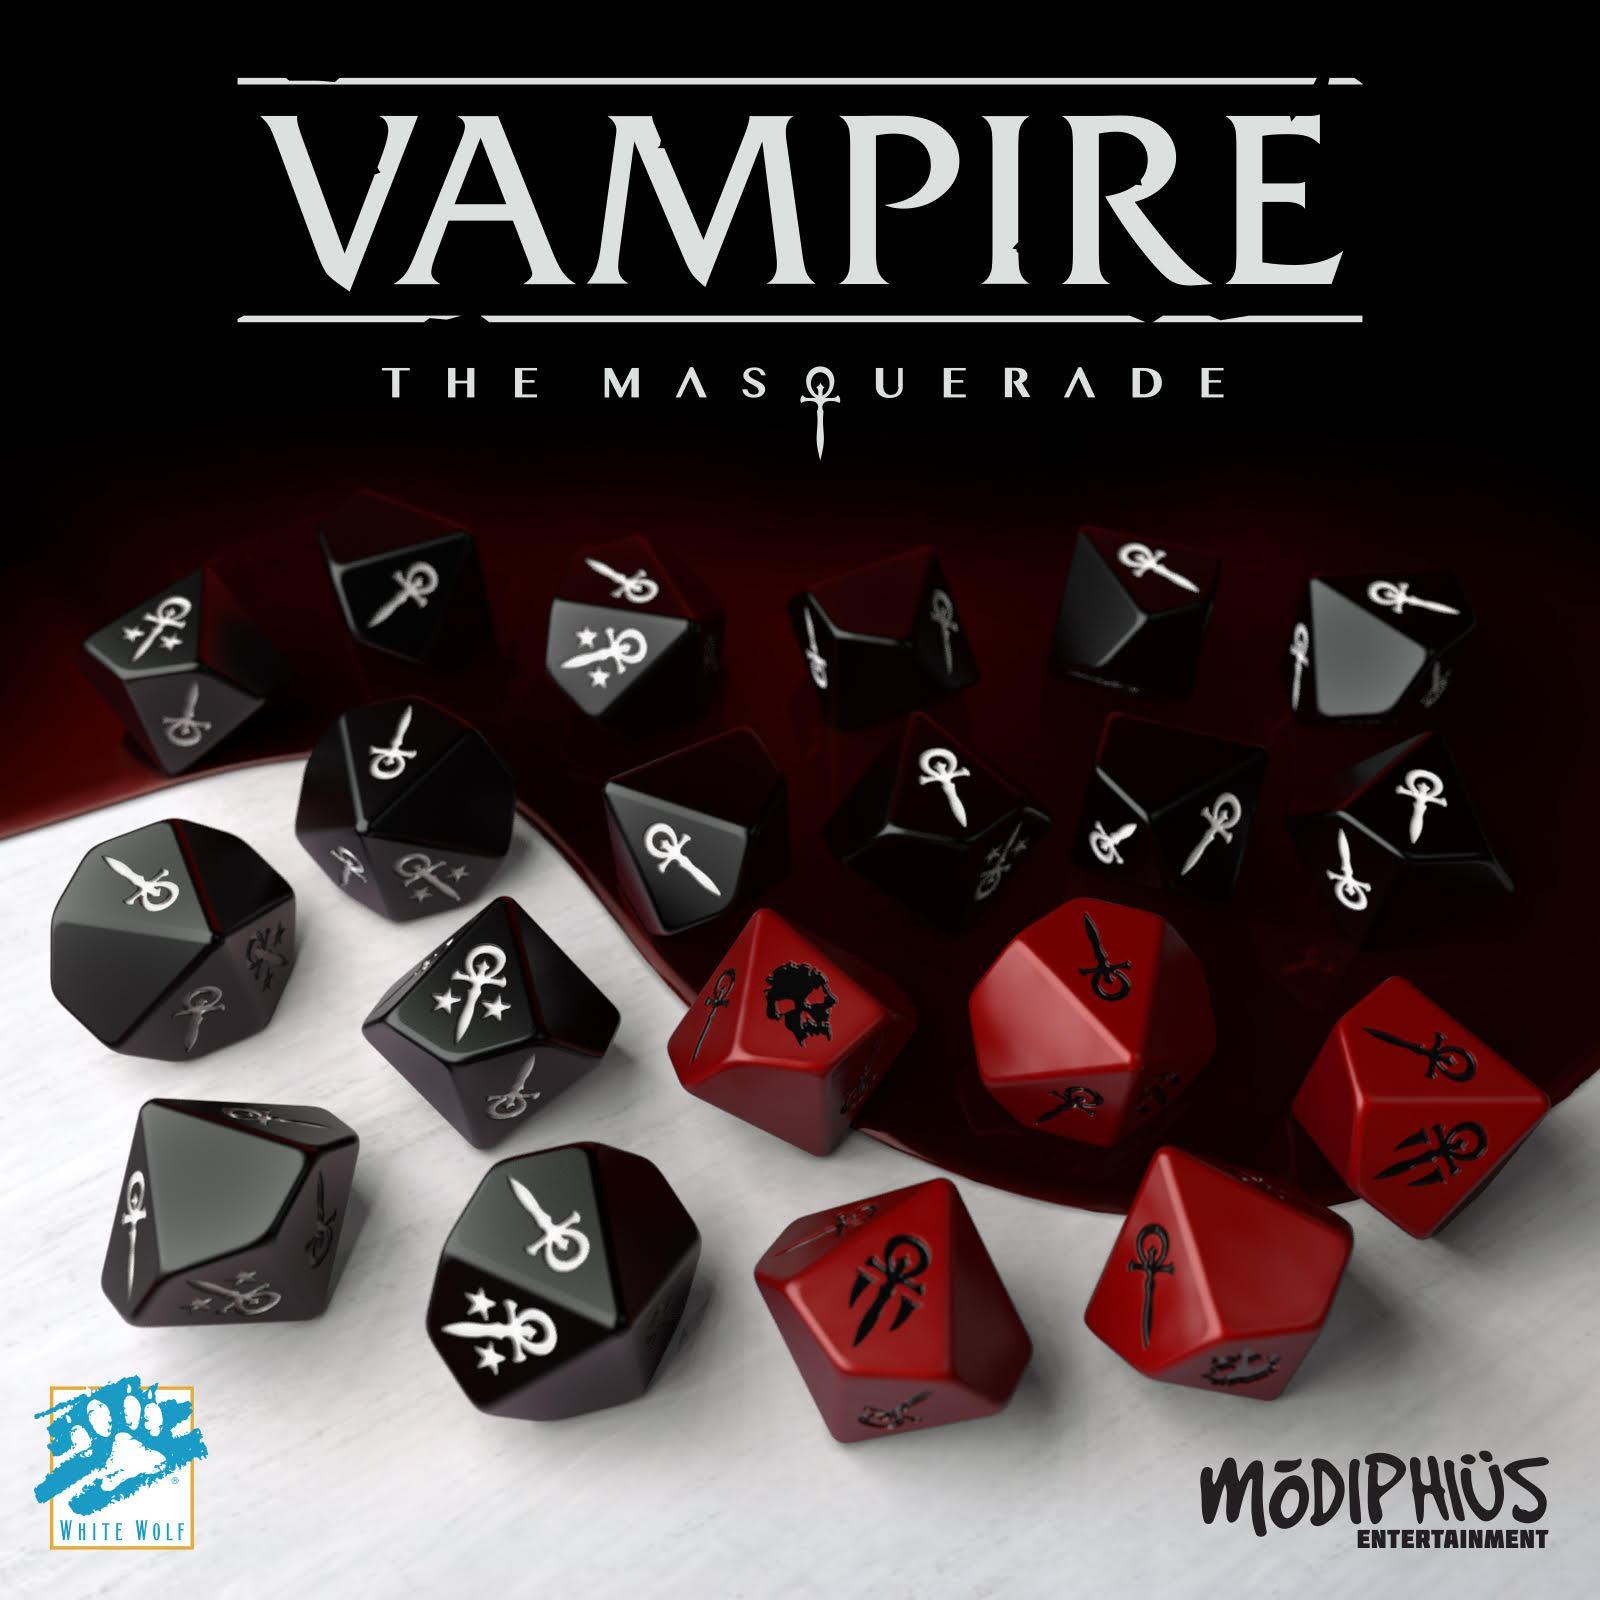 Vampire Masquerade Dice Set D10 20stk